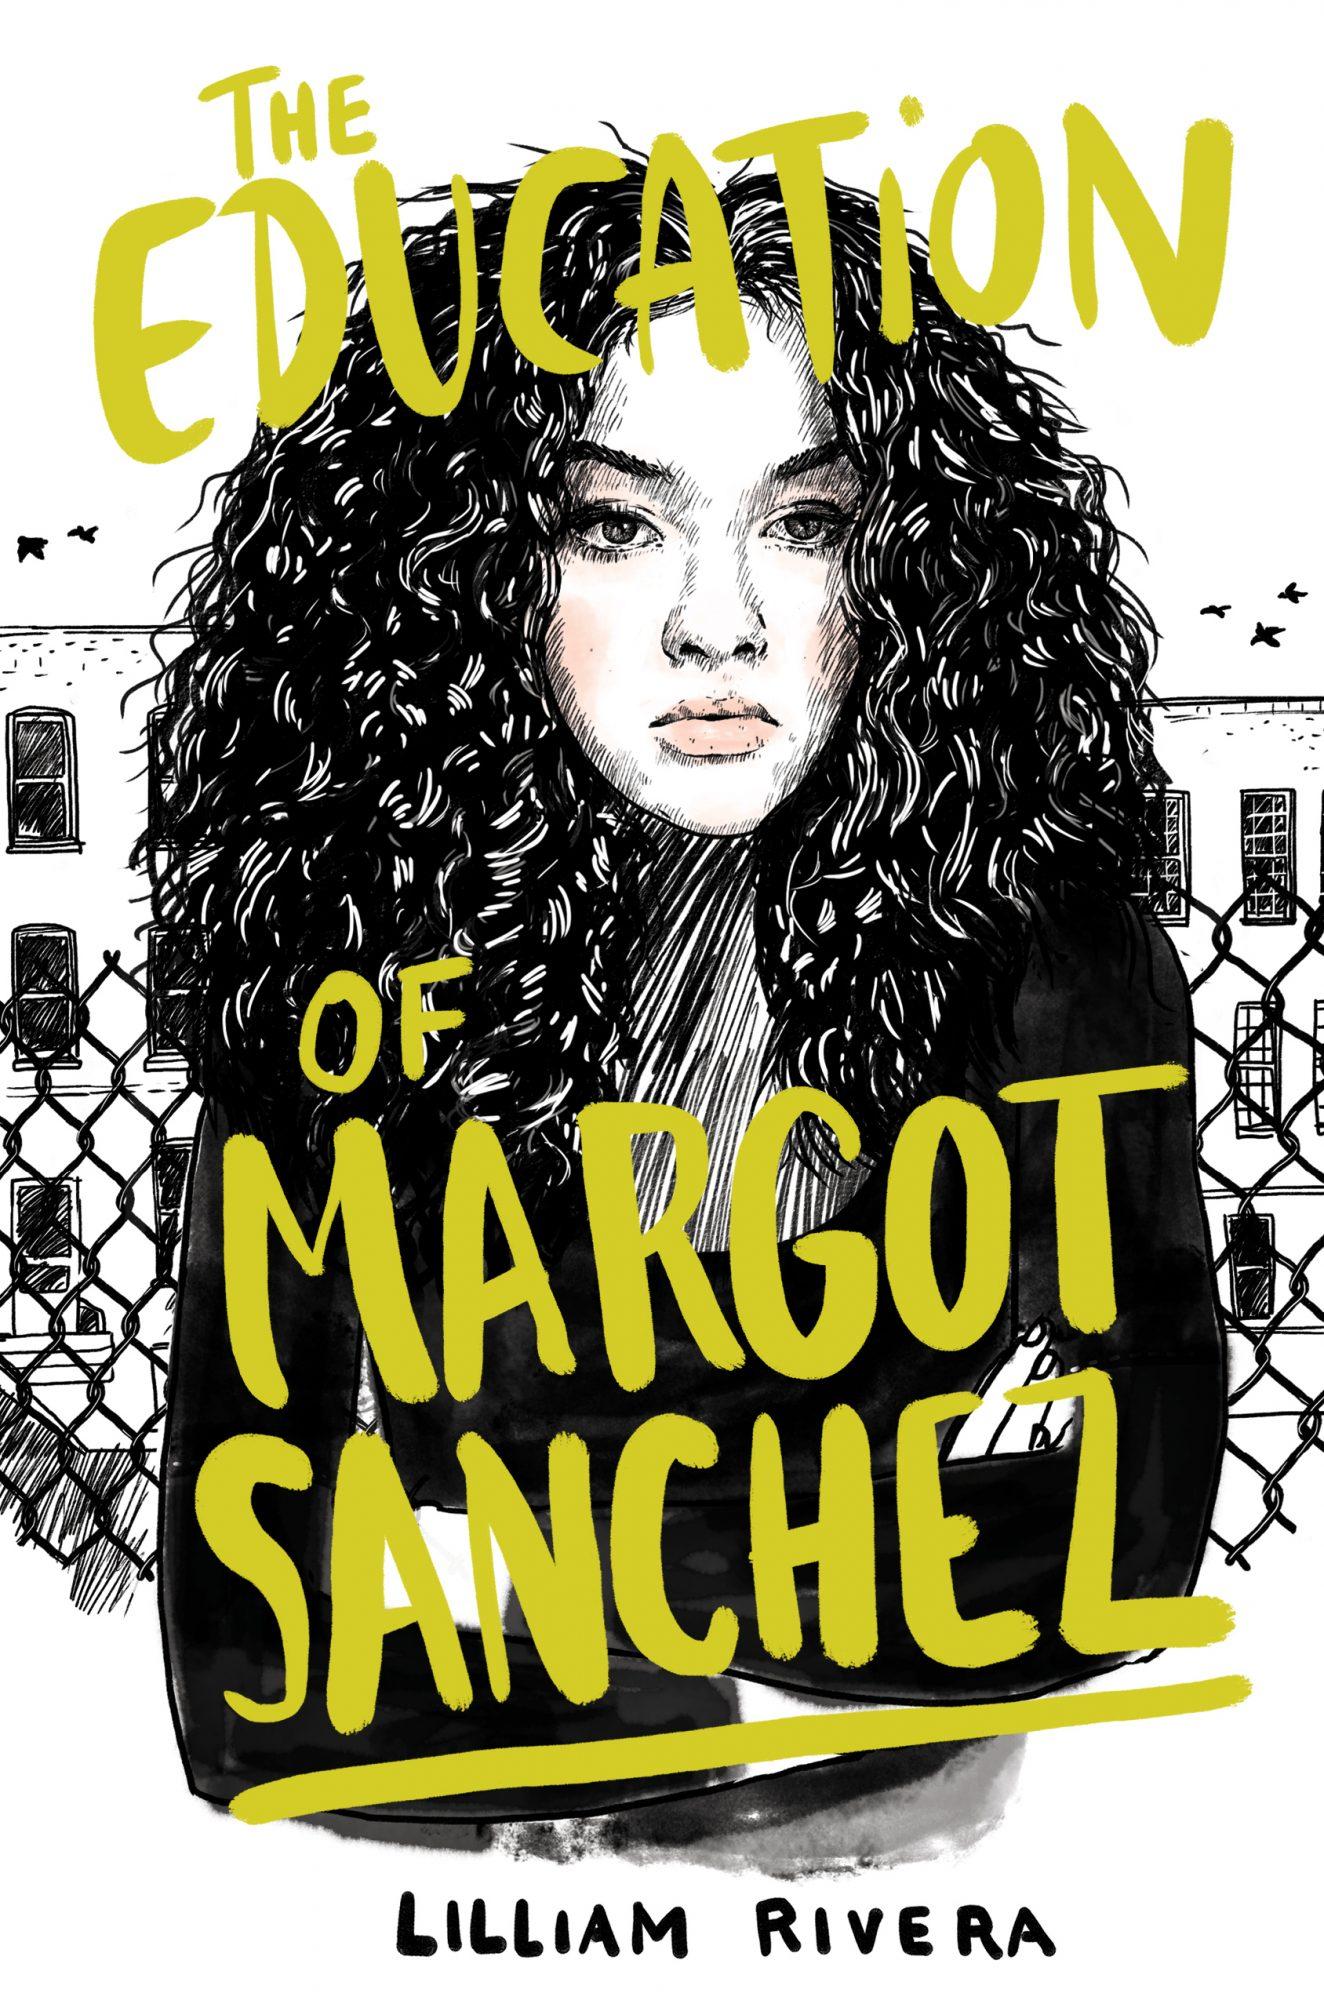 THE-EDUCATION-OF-MARGOT-SANCHEZ.jpg